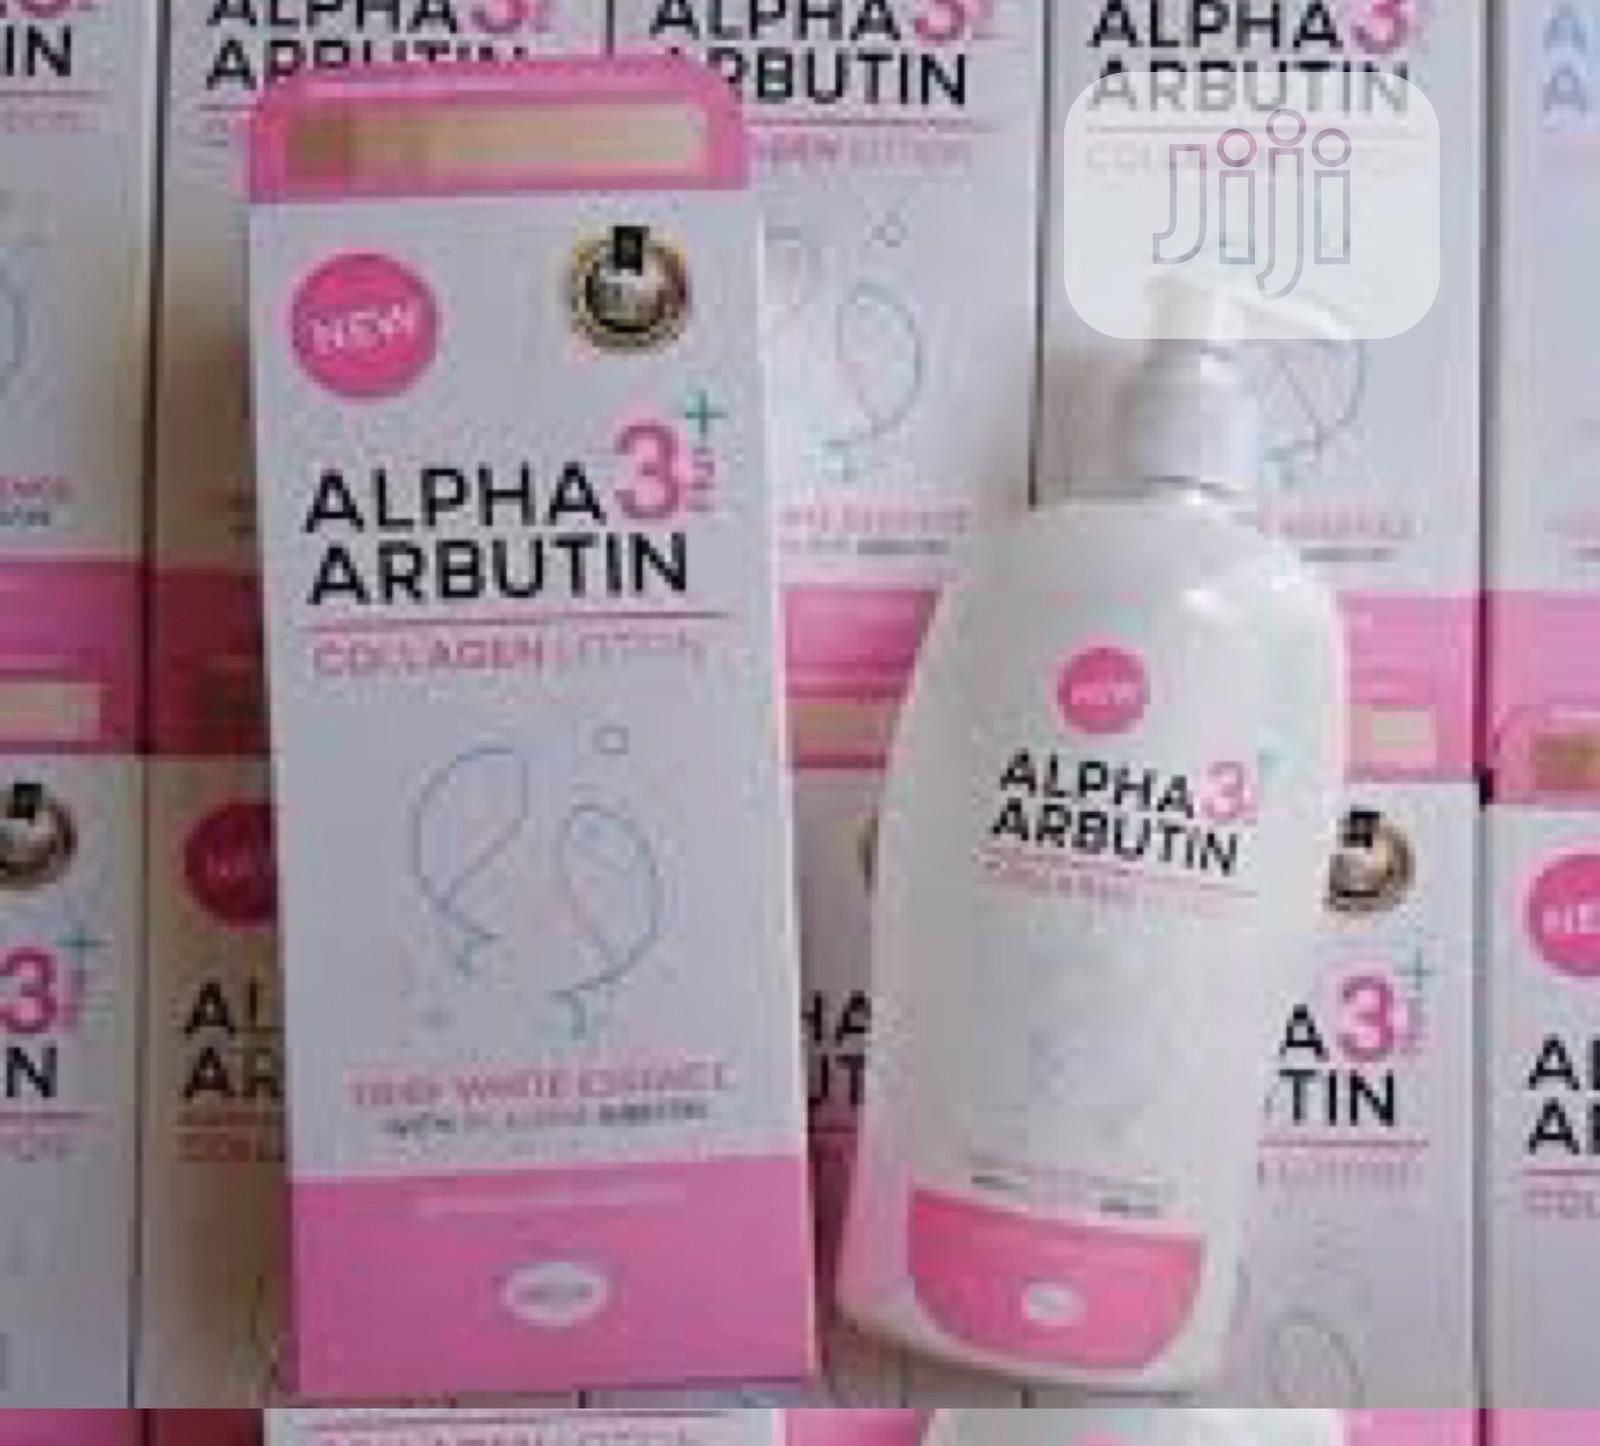 Alpha Arbutin 3plus+ Collagen Lotion 500ml